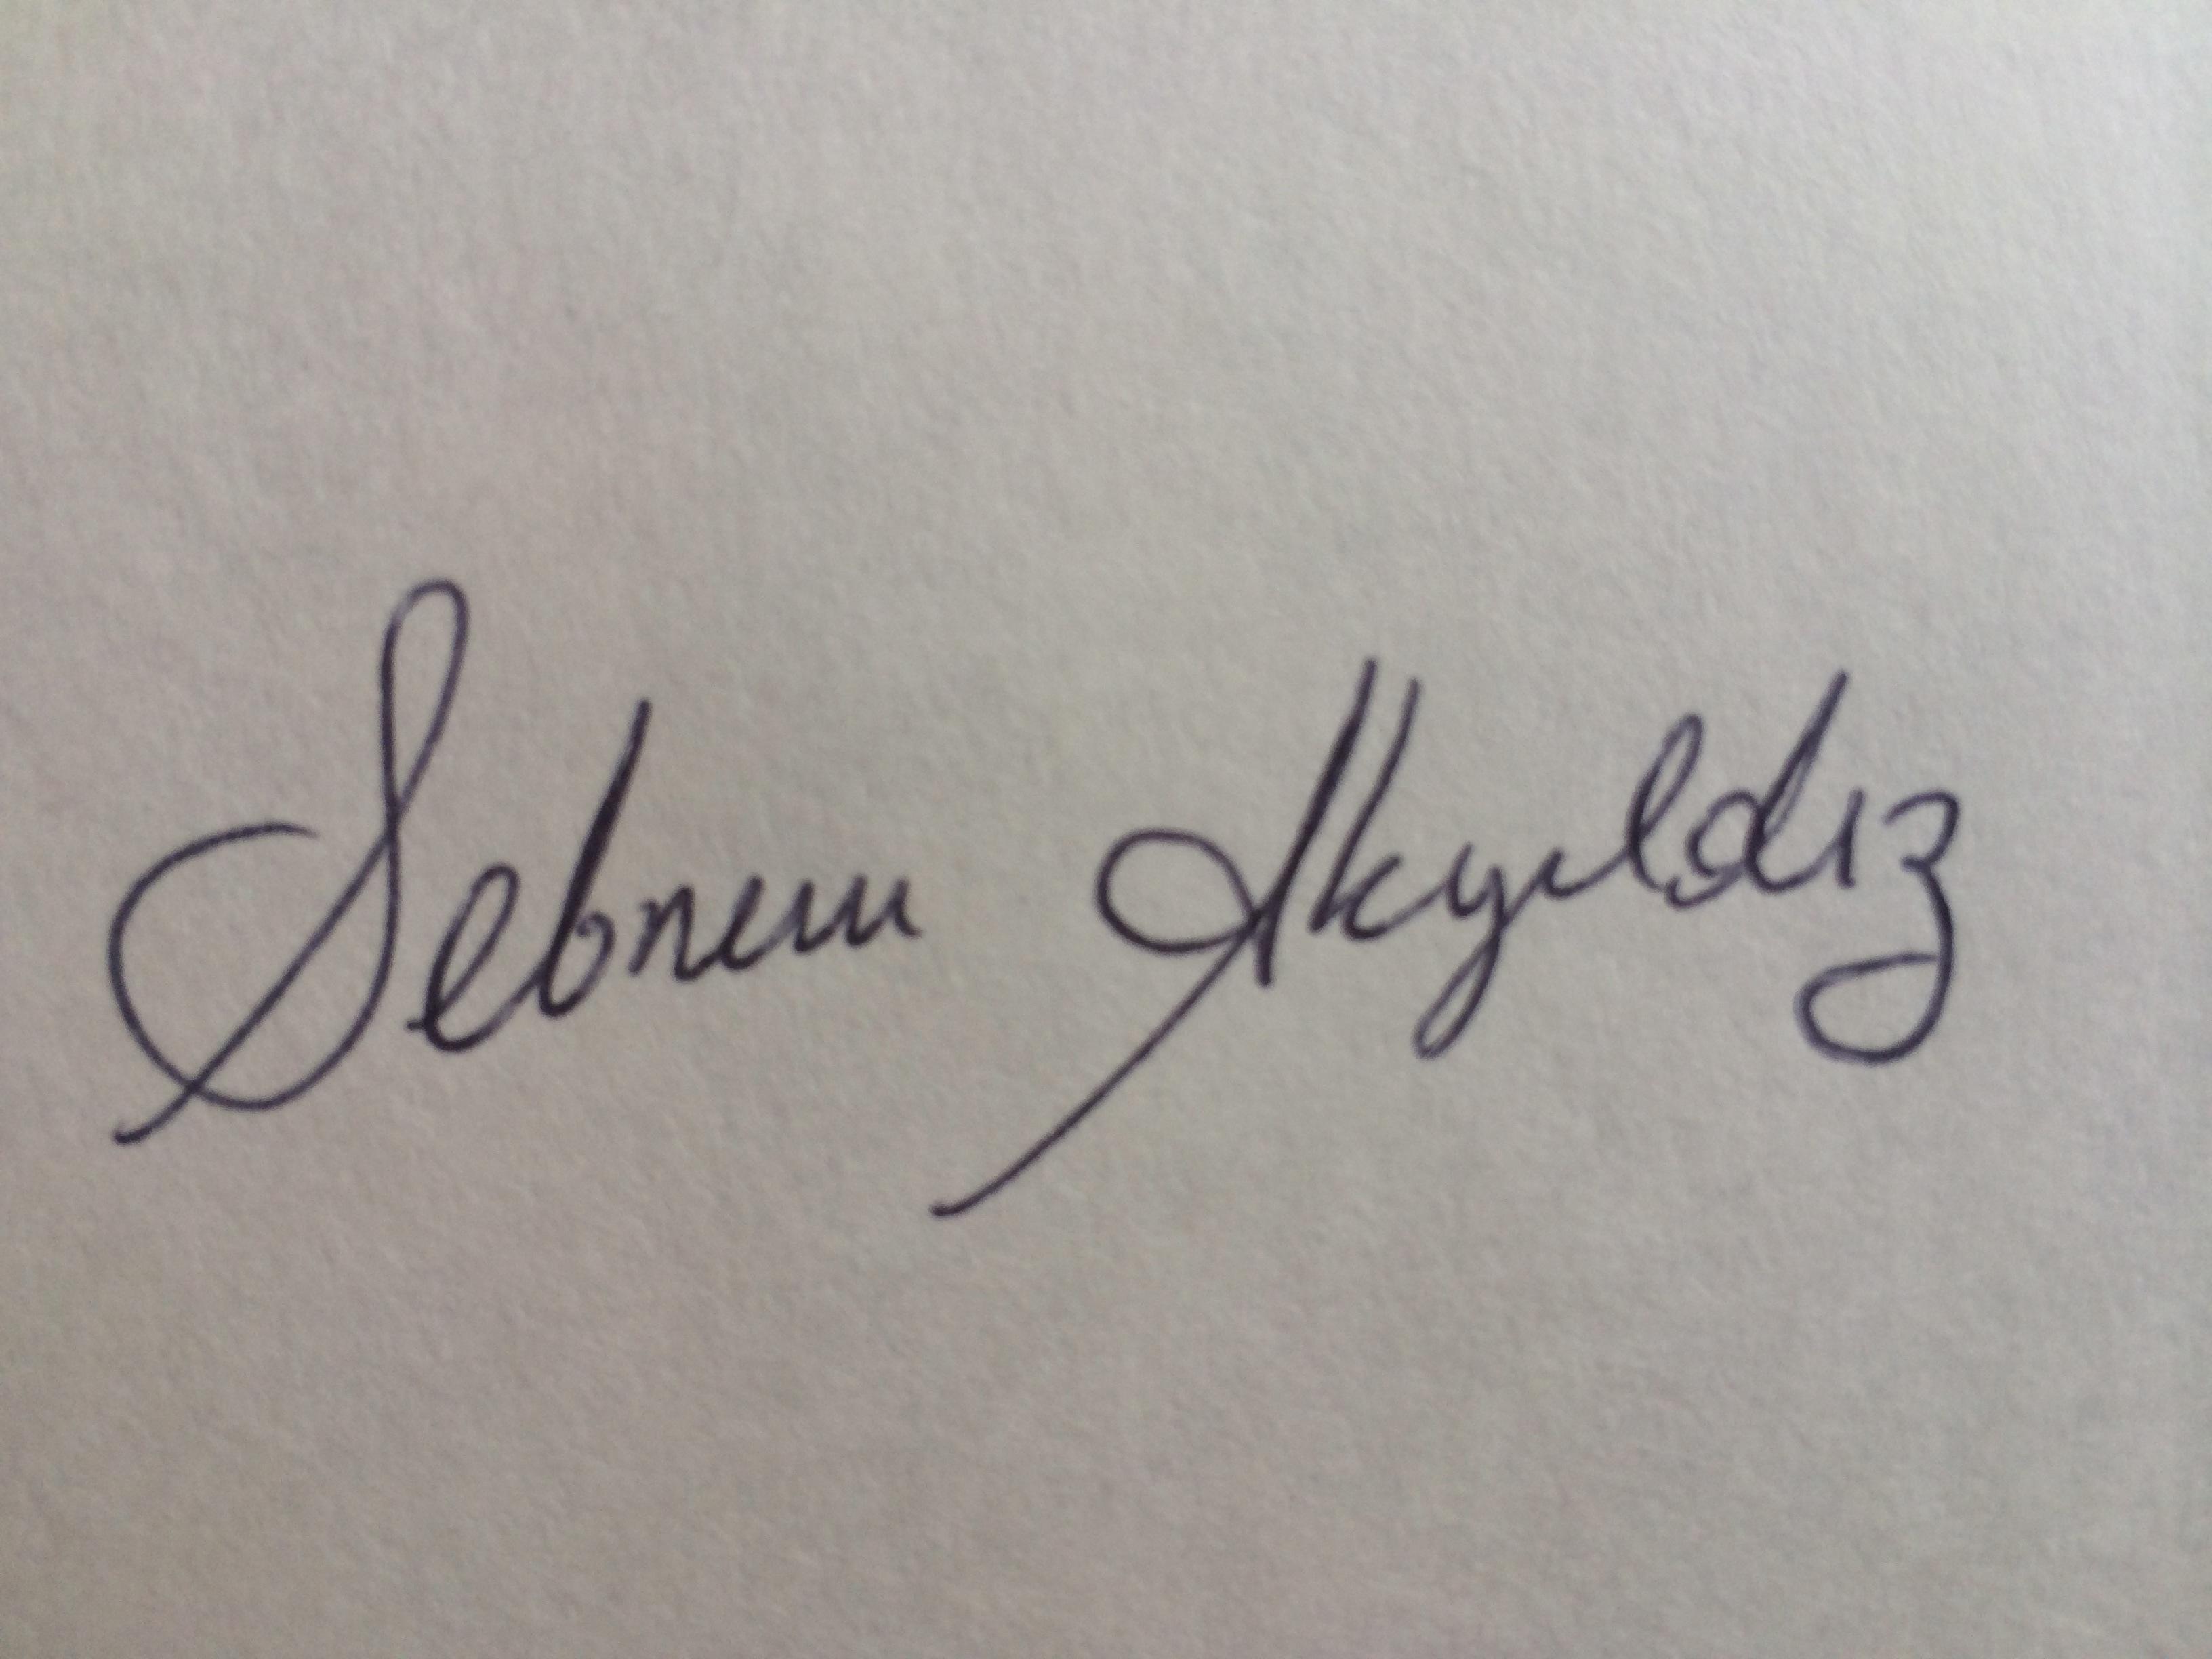 Sebnem AKYILDIZ's Signature